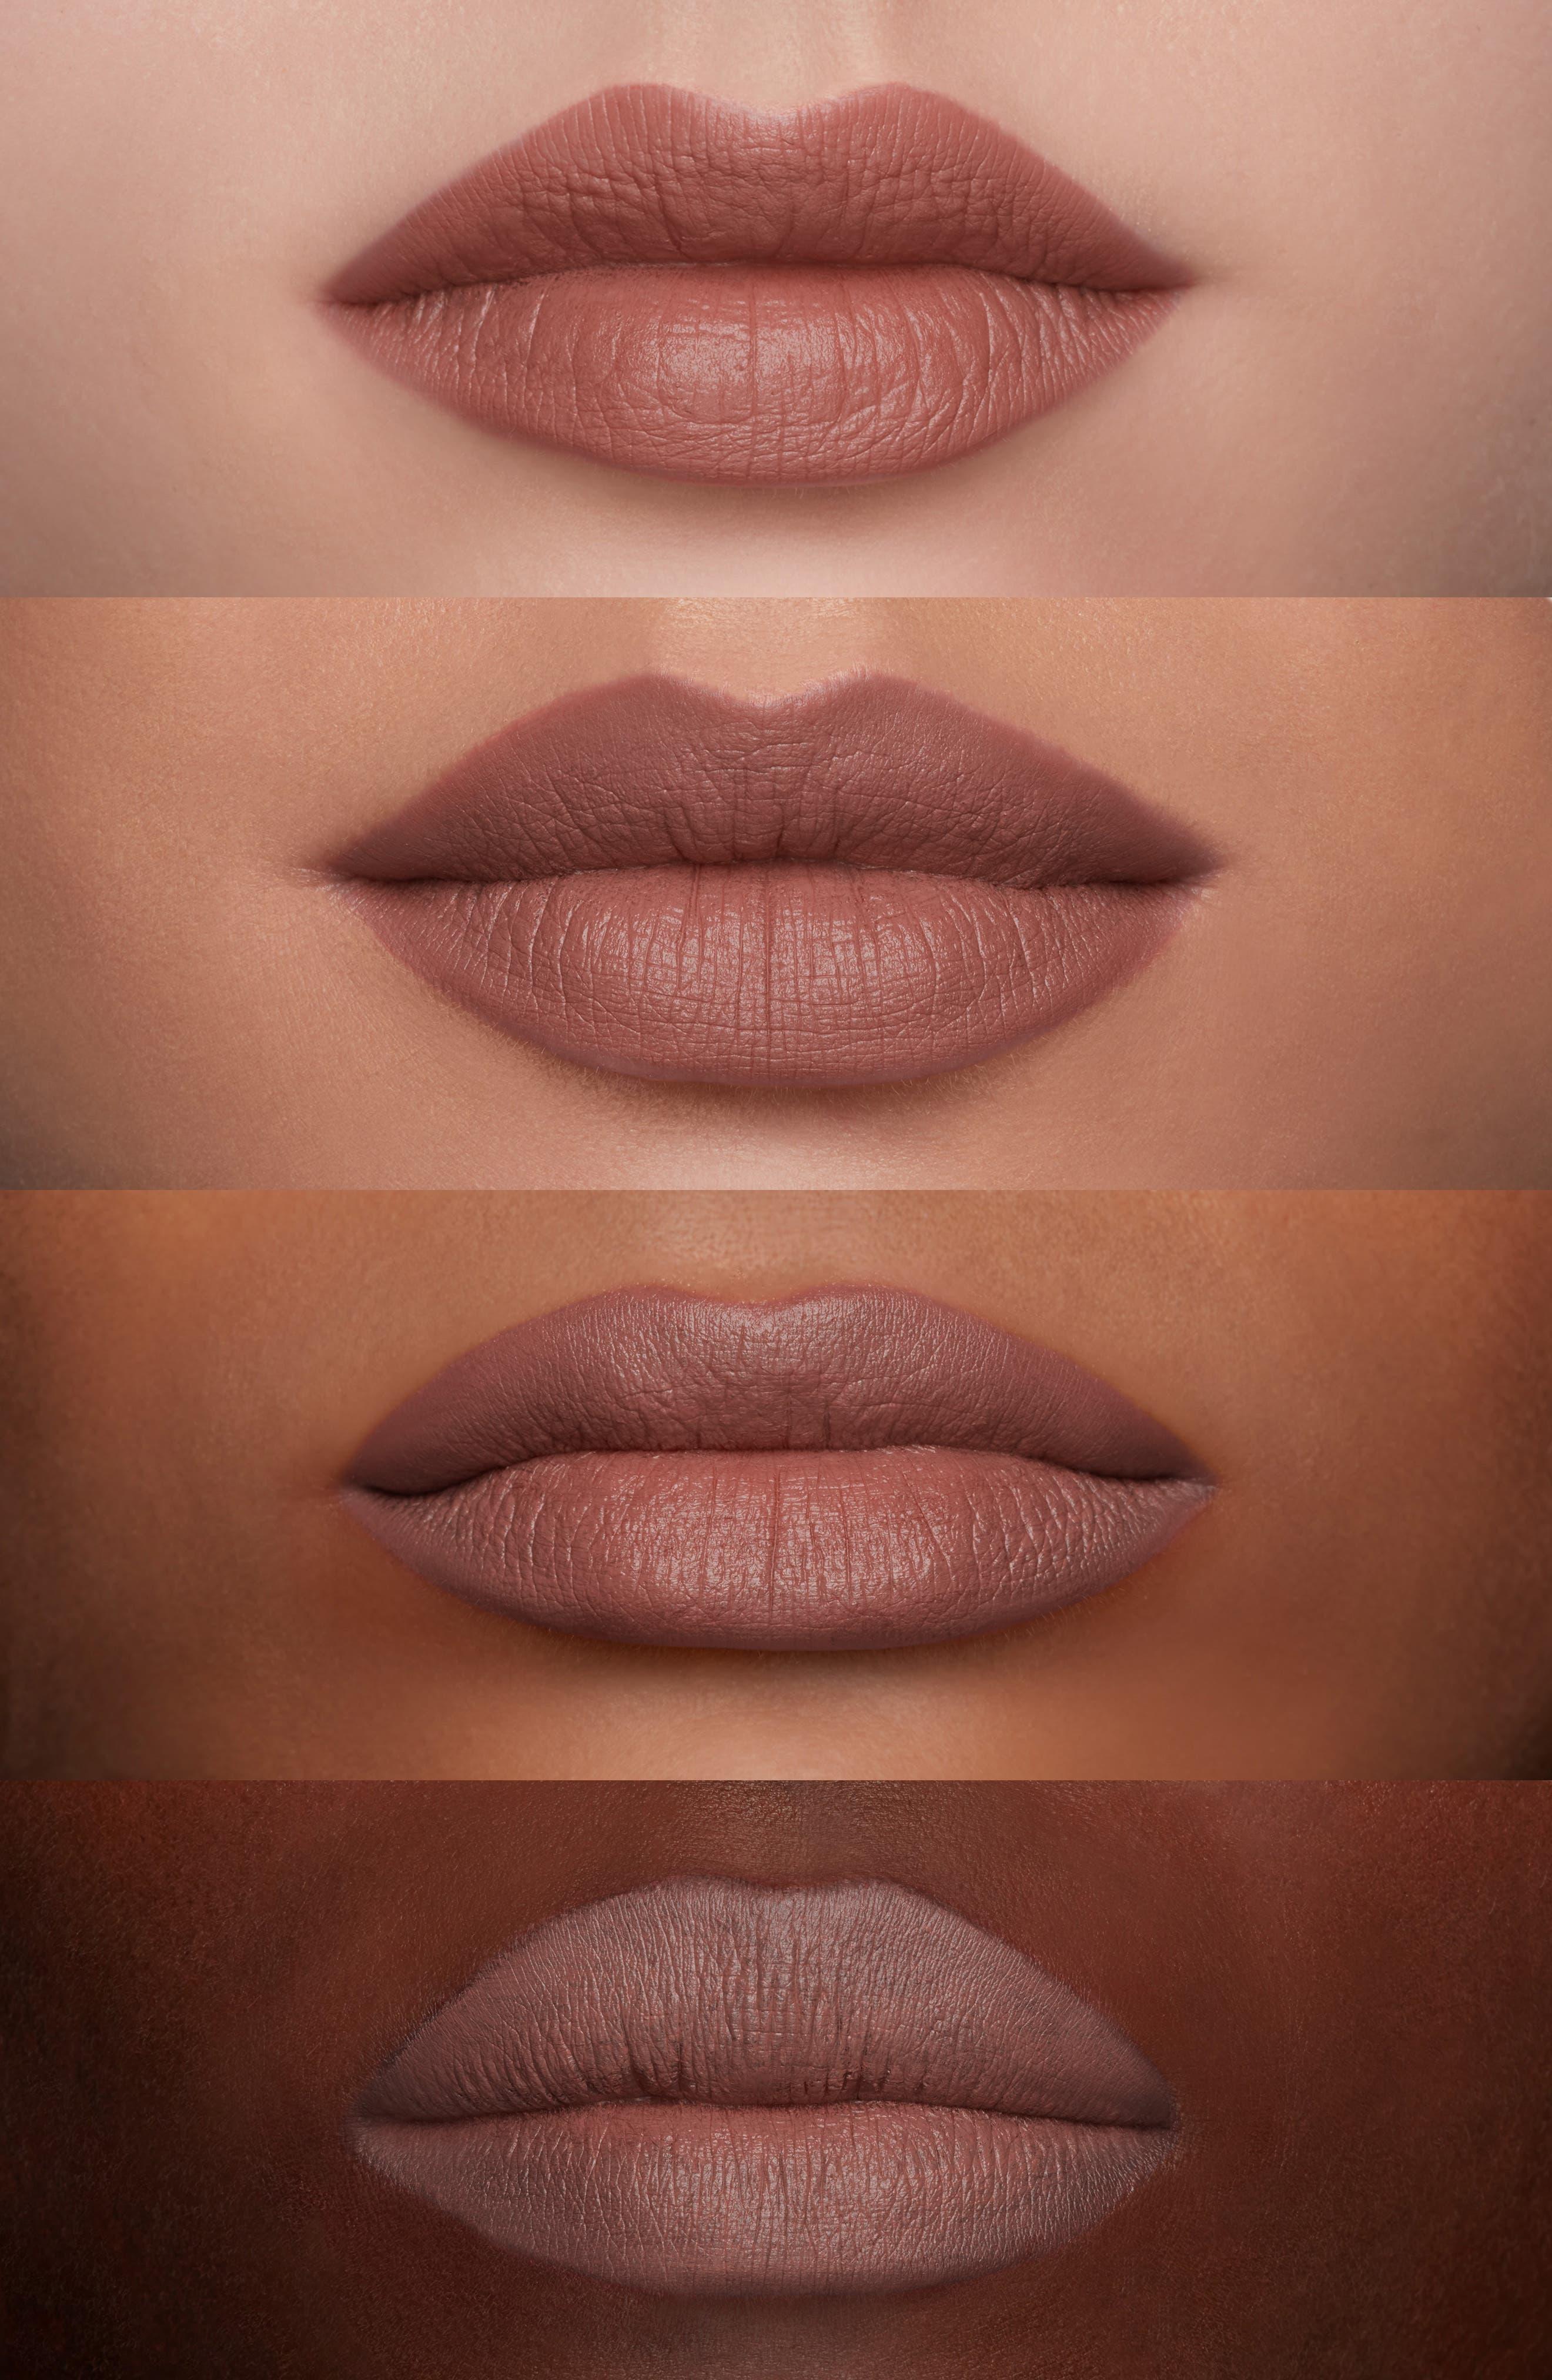 MAC 'Viva Glam' Taraji P. Henson II Lipstick,                             Main thumbnail 6, color,